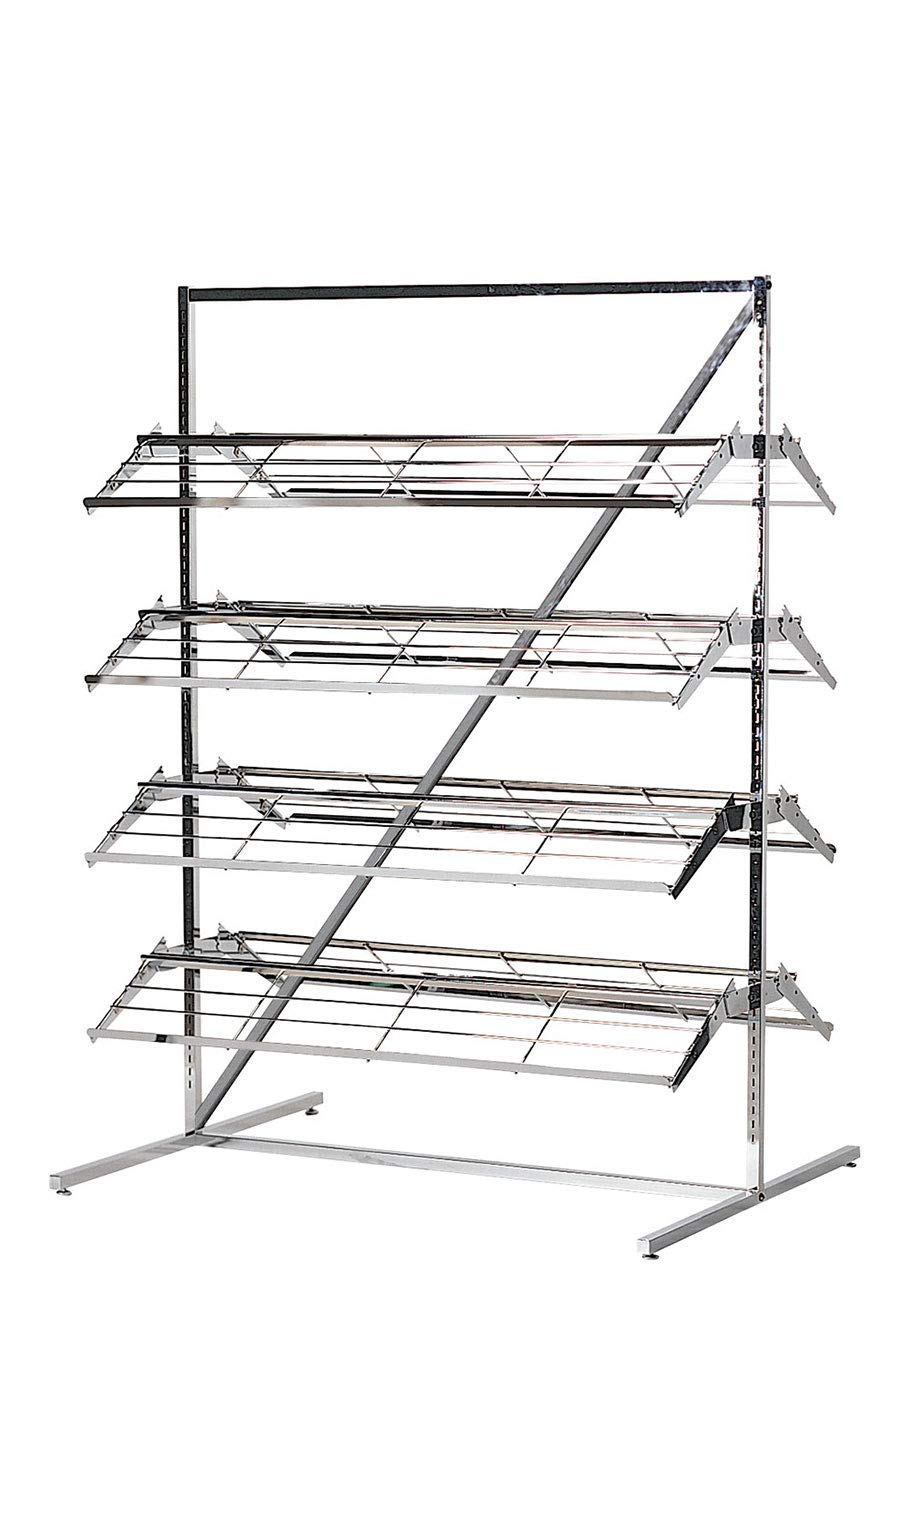 shoes Merchandiser 8 Shelf 60-80 Pair Floor Display Rack 66H x 37W x 48L Inches